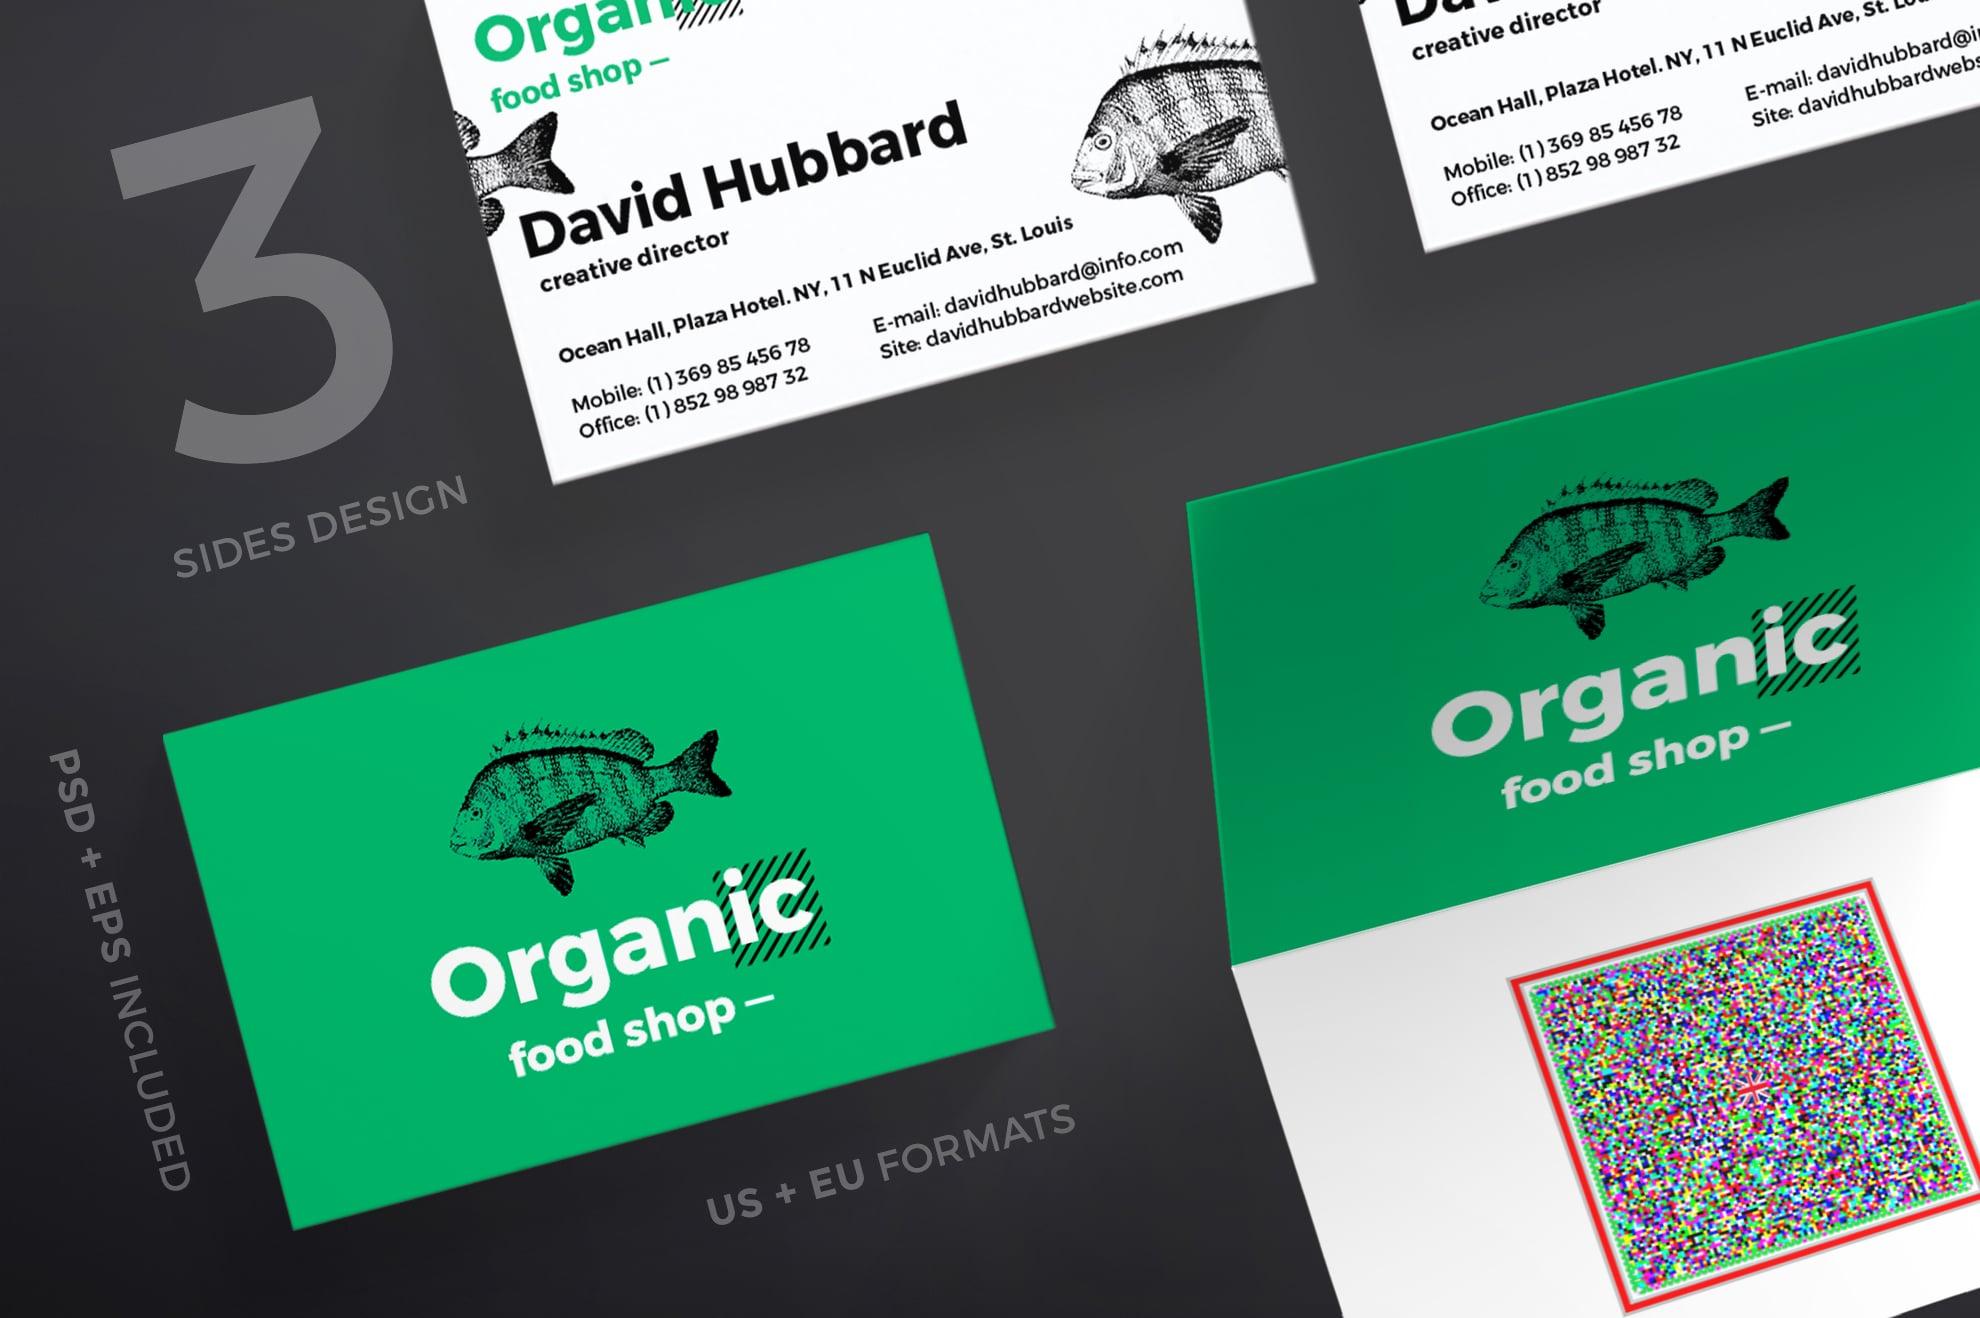 110 in 1 Business Card Bundle - 001 bc organic food shop 12 0